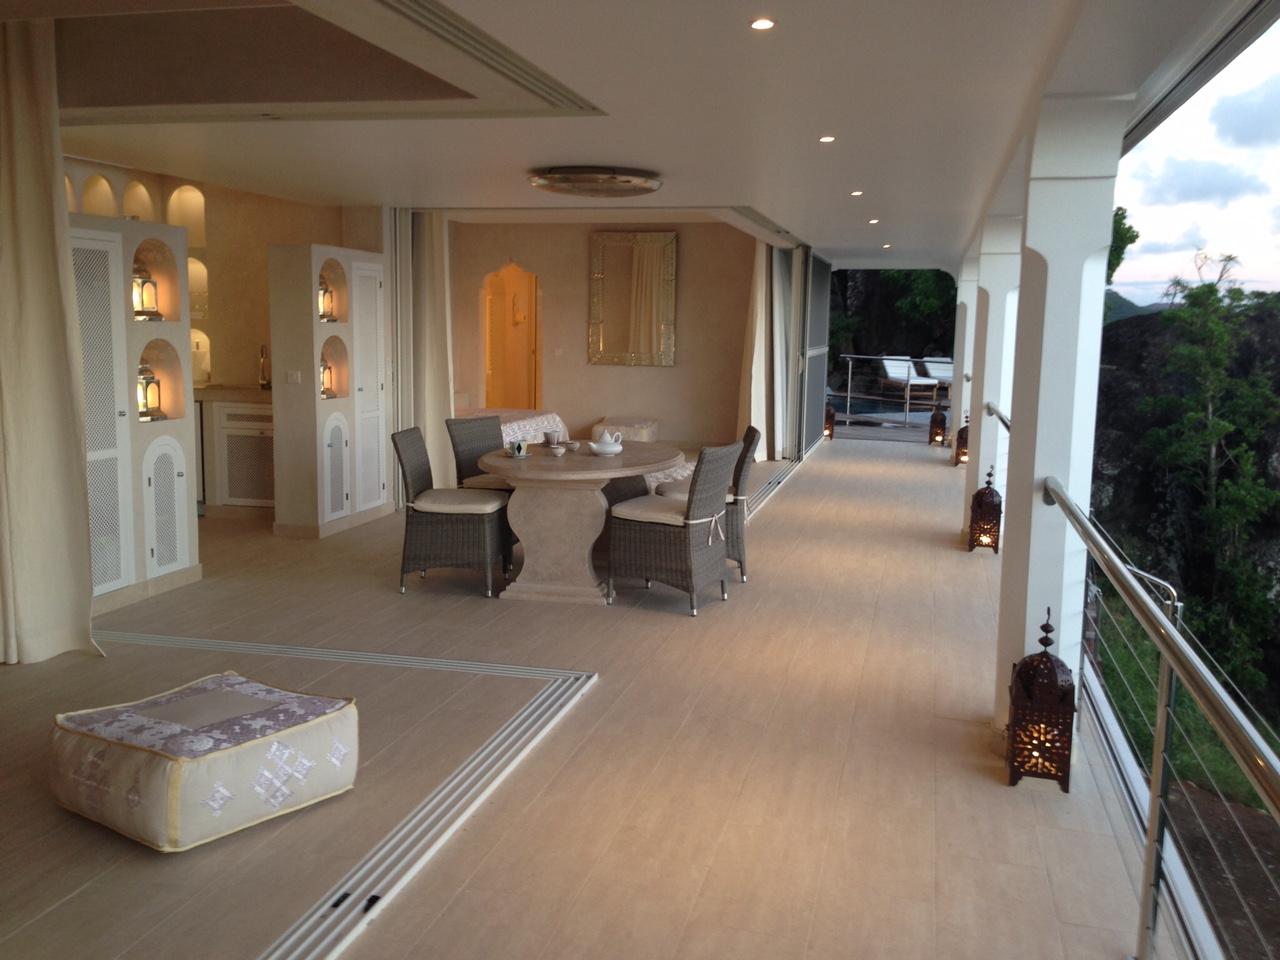 Villa Sheherazade - Morrocan Style Villa for Rent St Barth Perfect for Honeymoon - Main Area